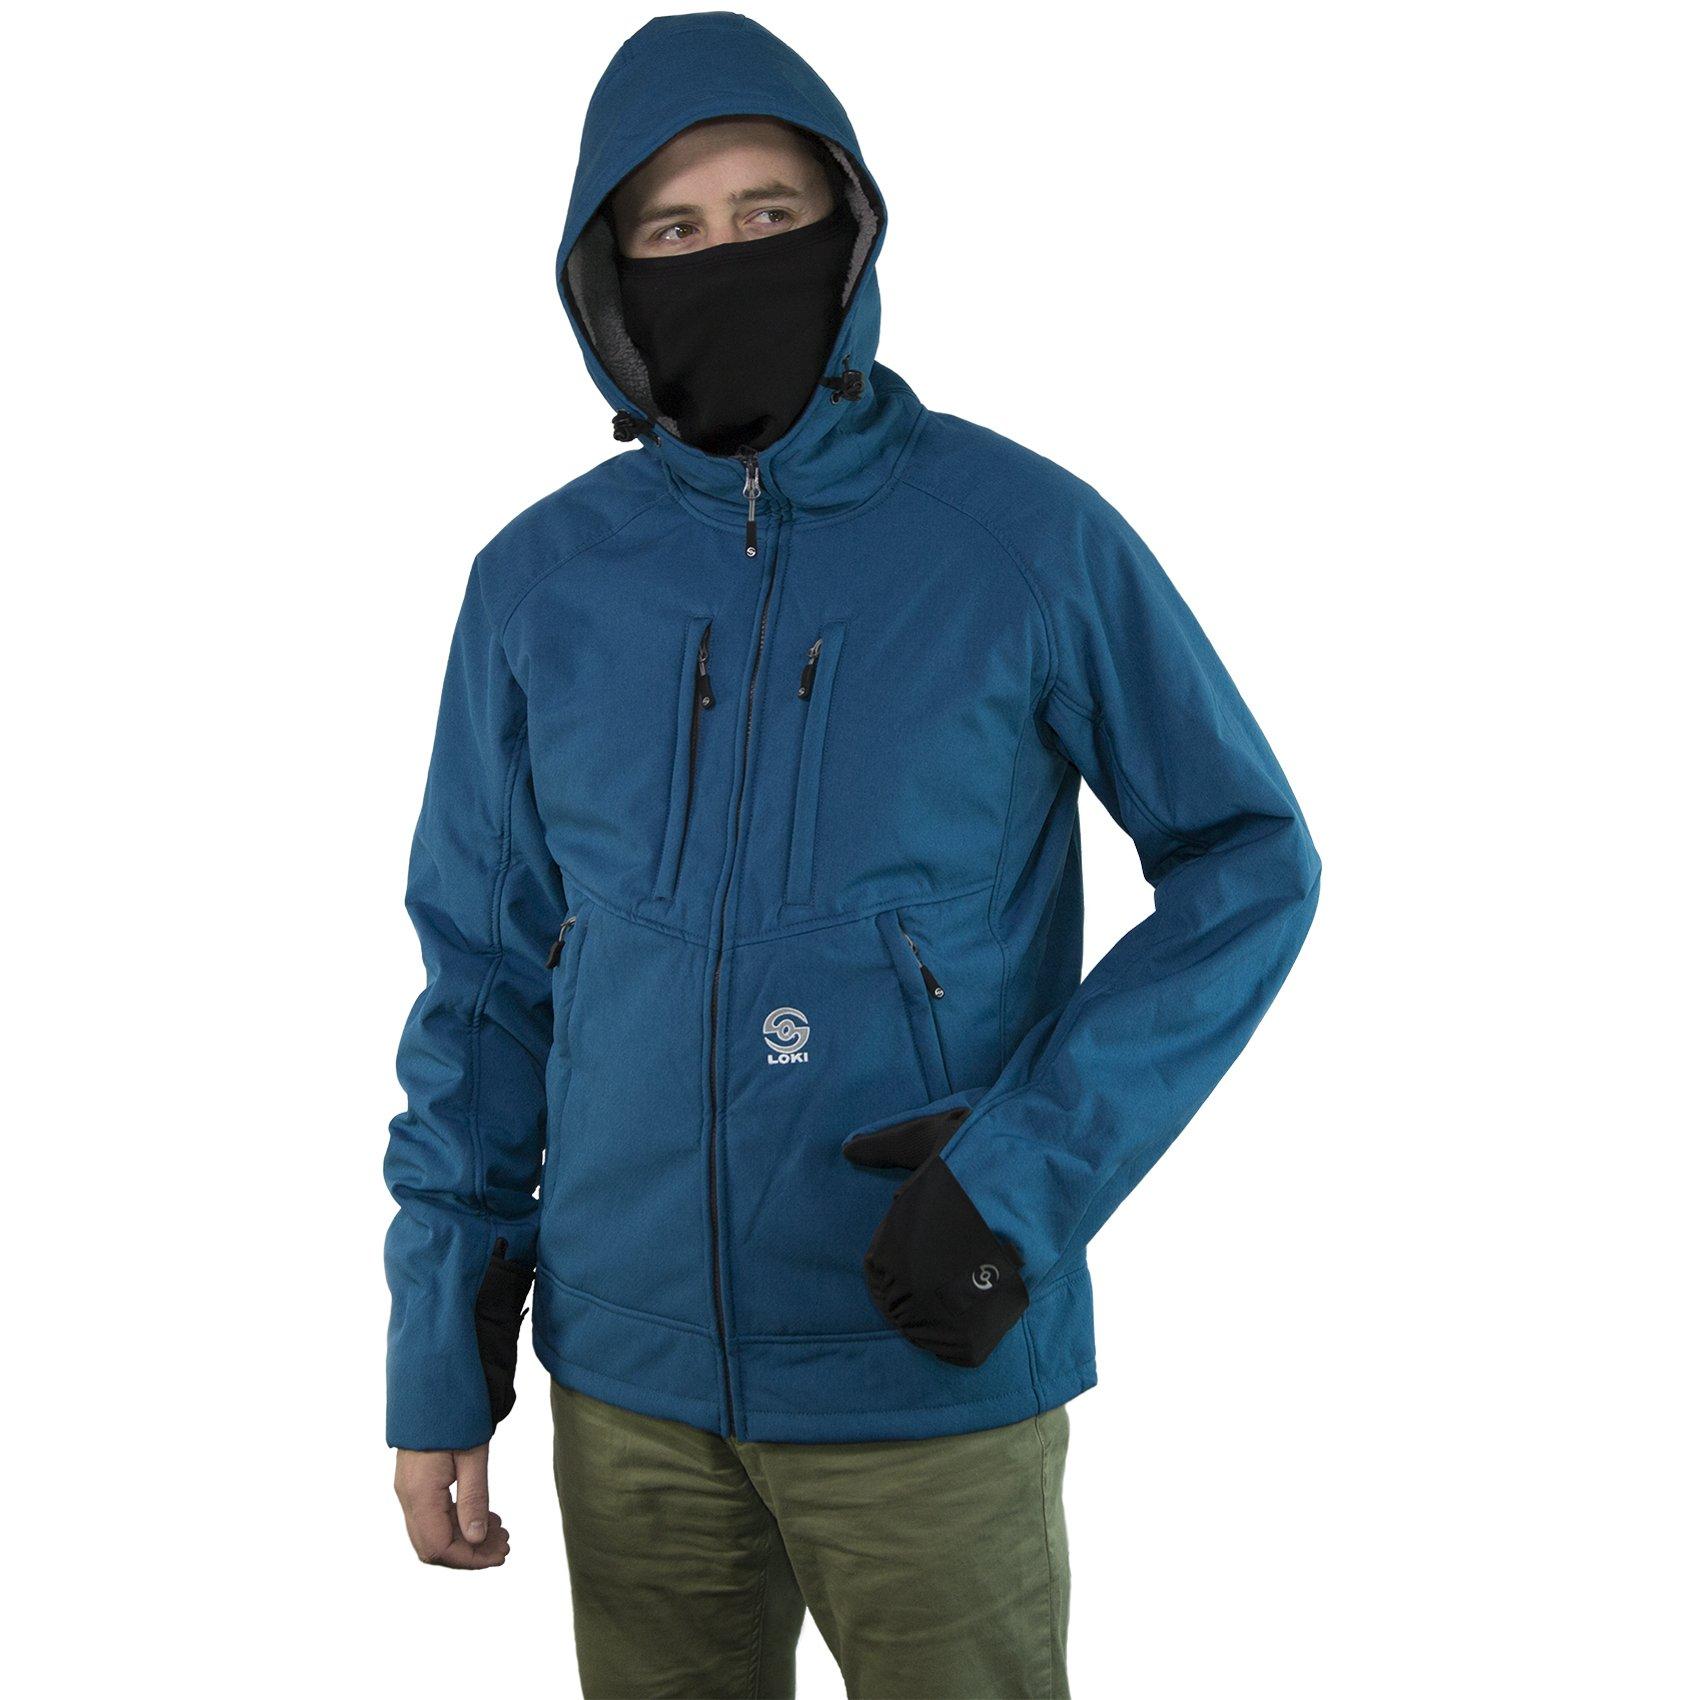 Mtn Hood Extreme Men Blue Lg by Loki